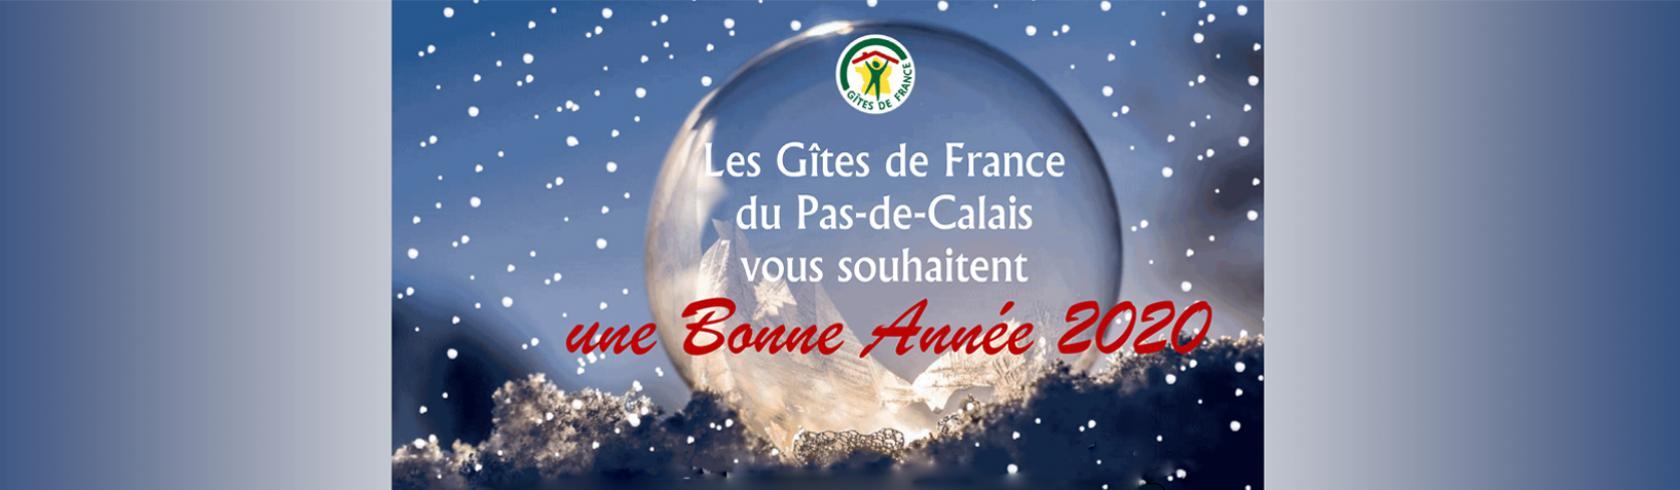 Gîtes De France Pas De Calais Location Vacances Nord Pas De